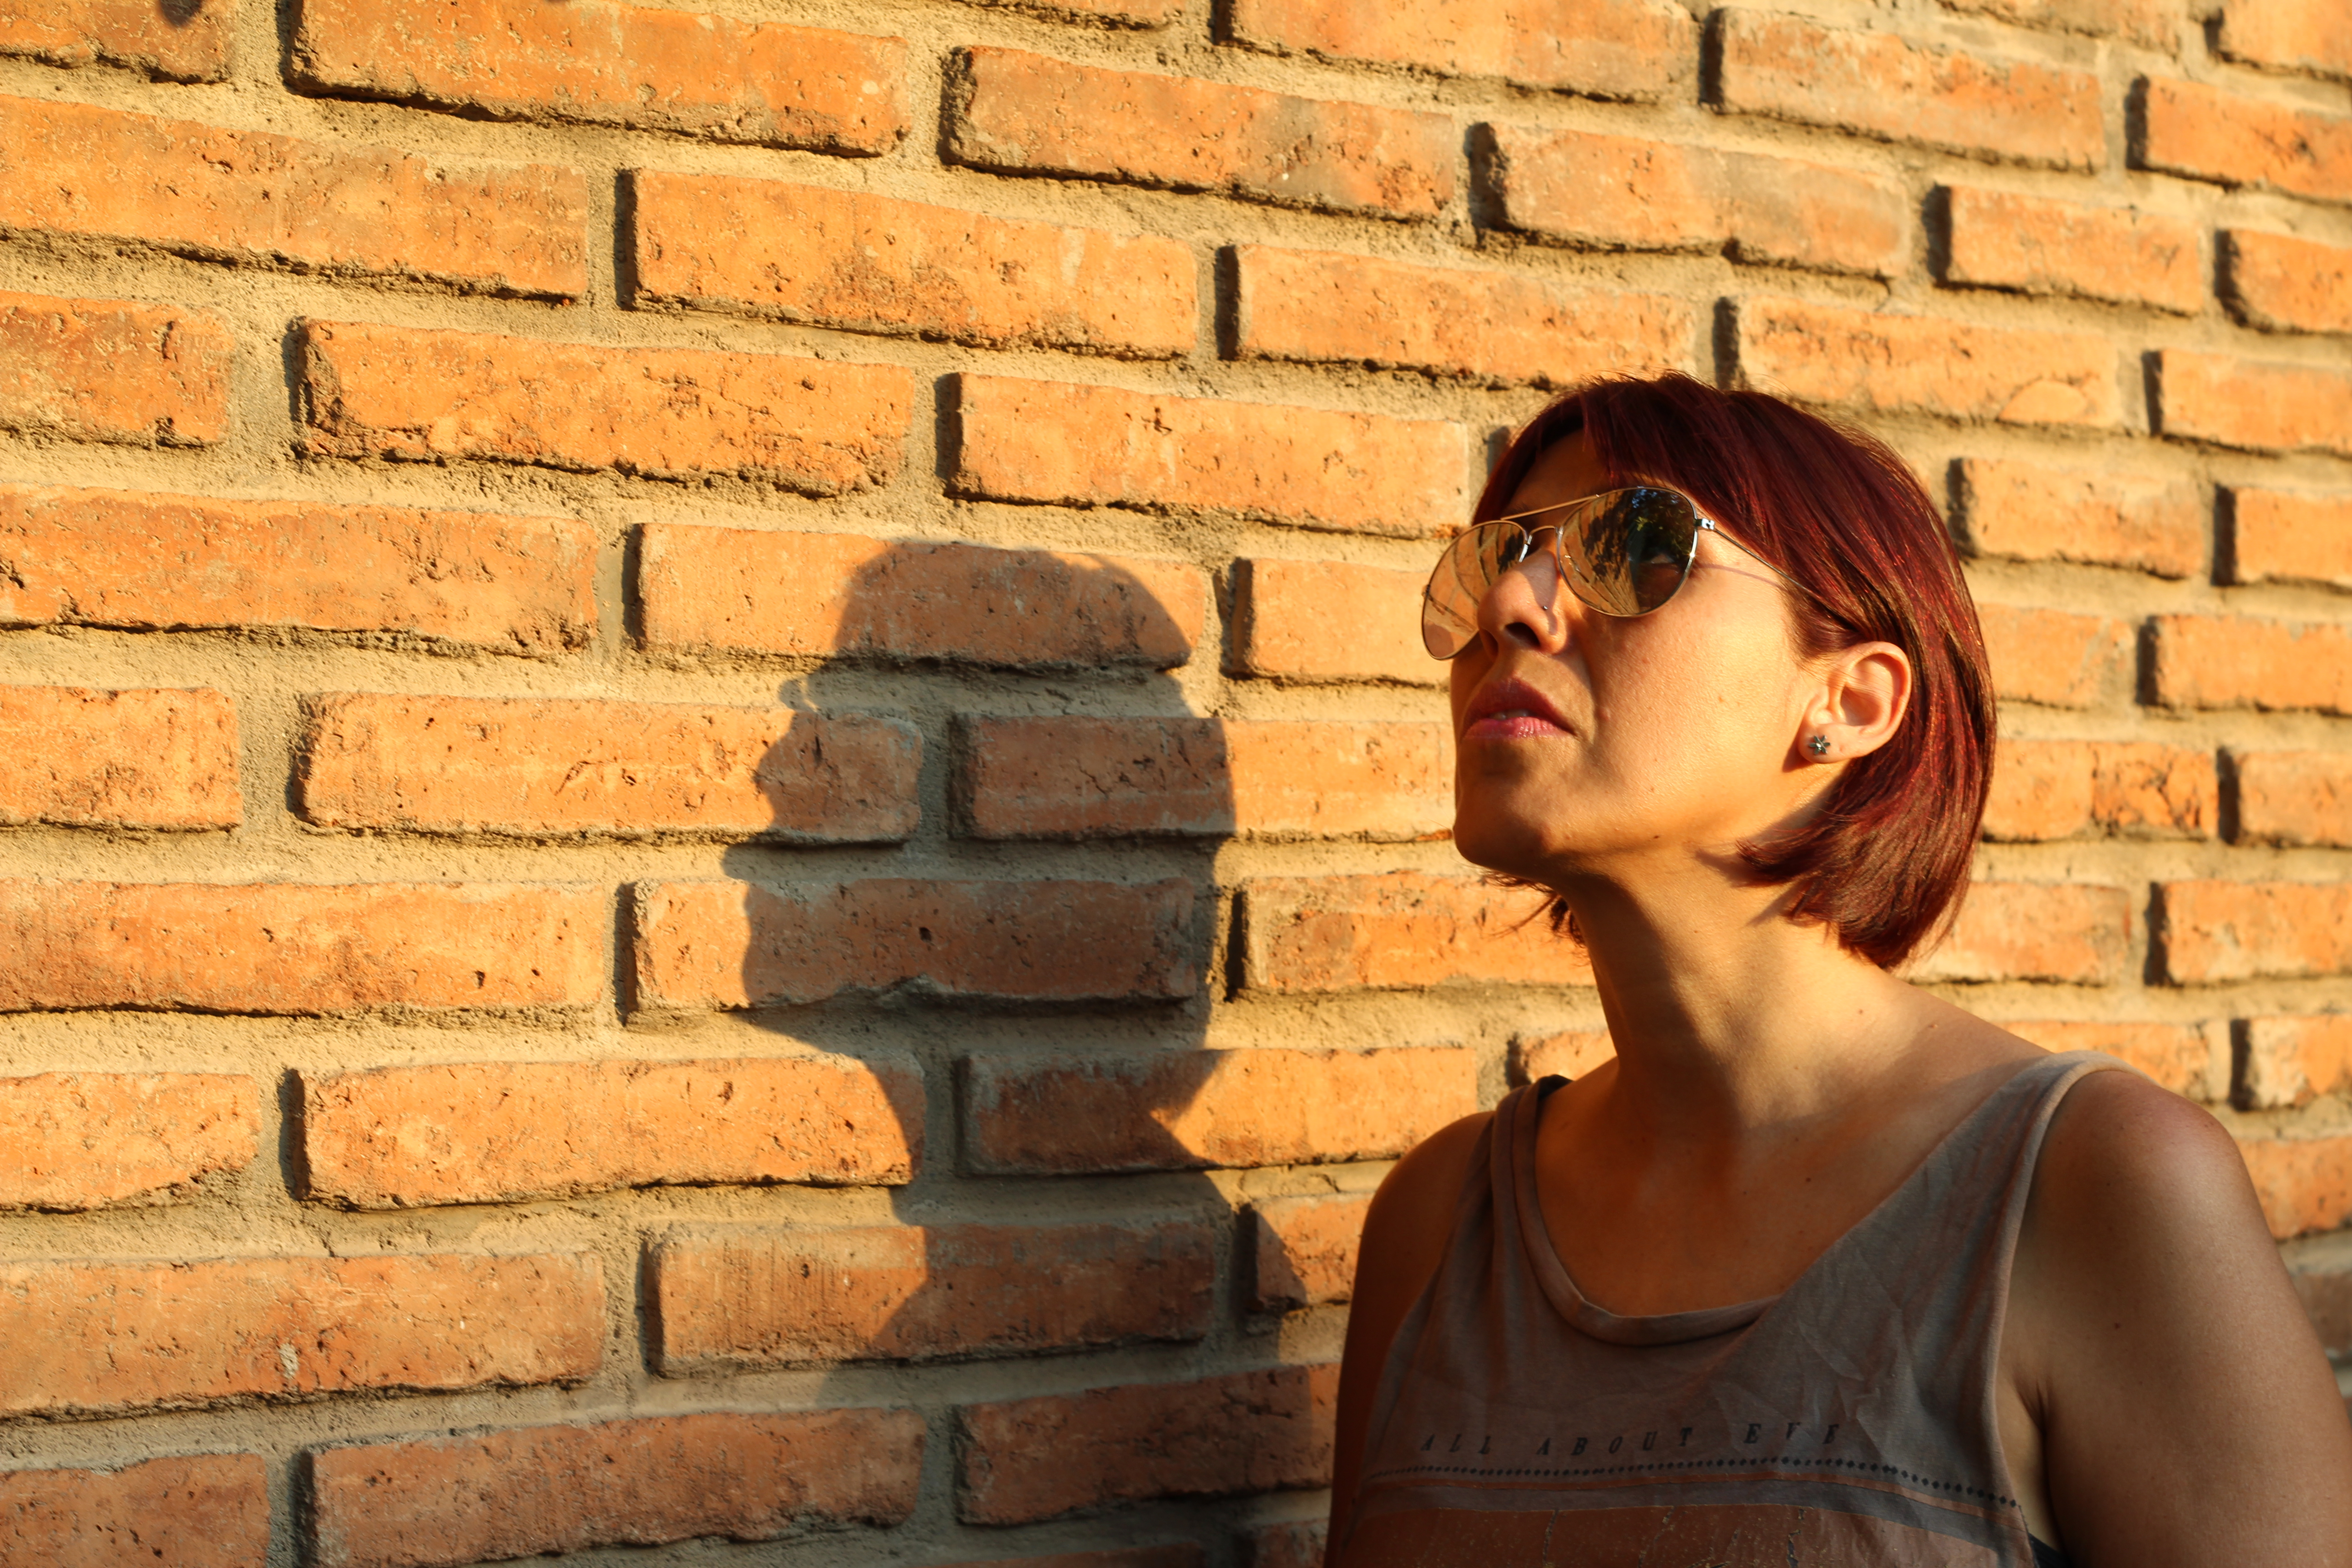 Verónica Manrique – Empoderando Emprendedores a través de la Fotografía e Imagen Visual